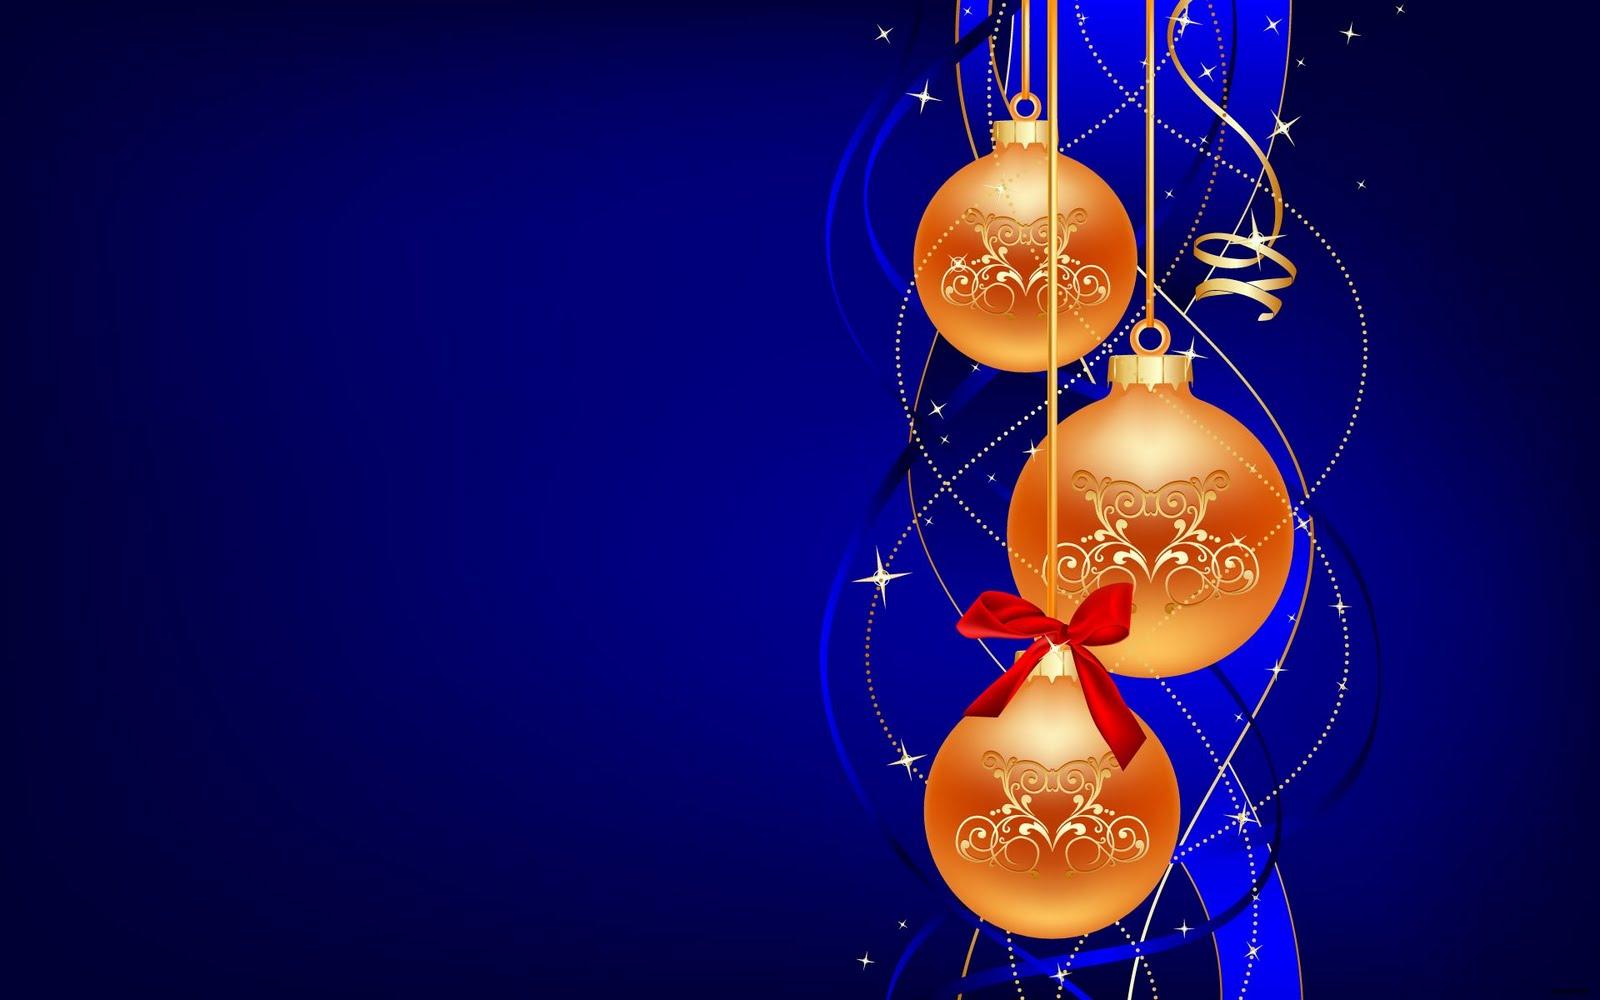 Sfondi desktop natale per pc cartolina natalizia for Sfondi natale 3d